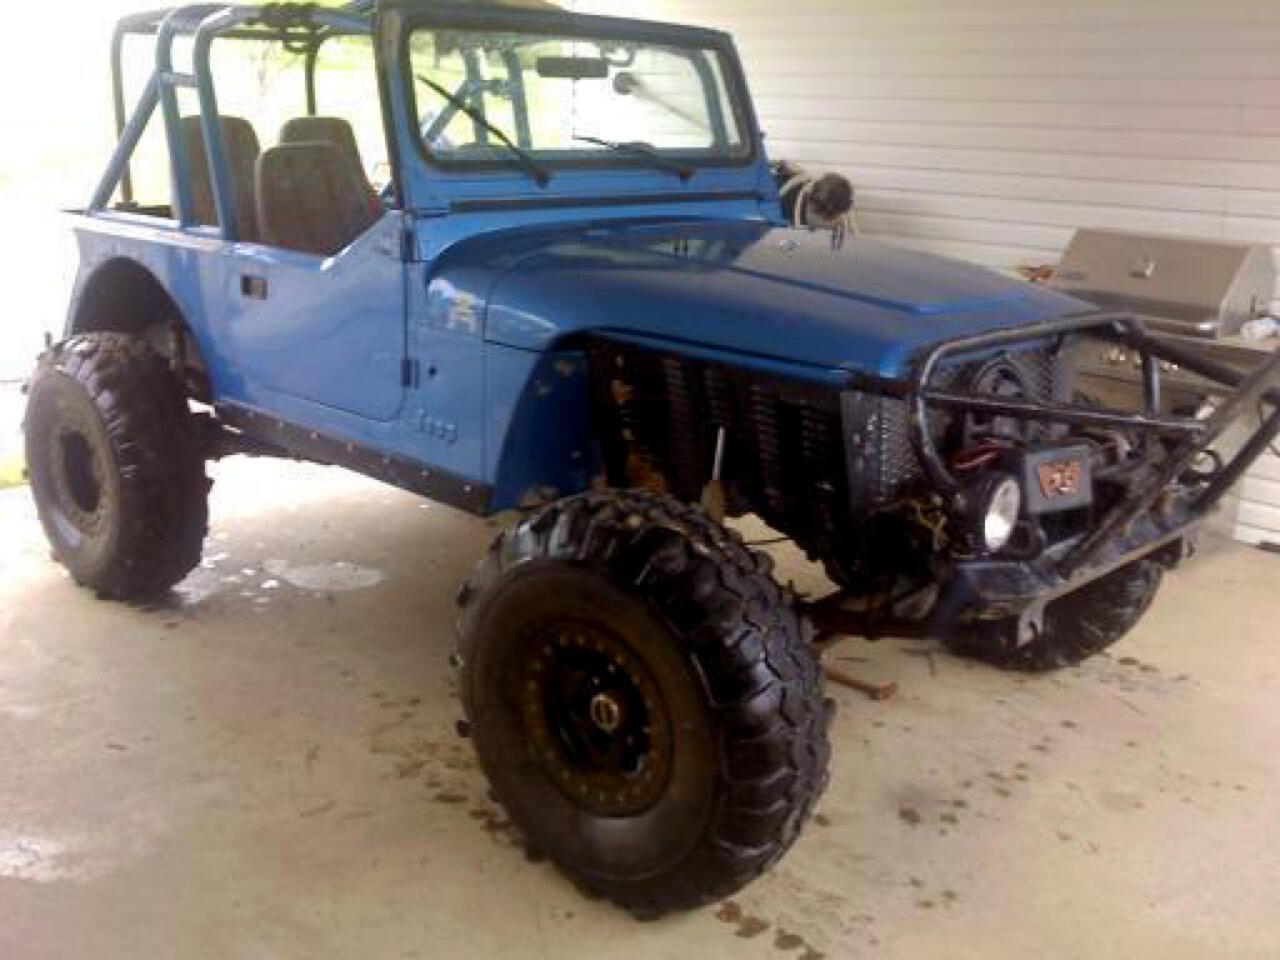 Jeep Wrangler 2dr Base 1987